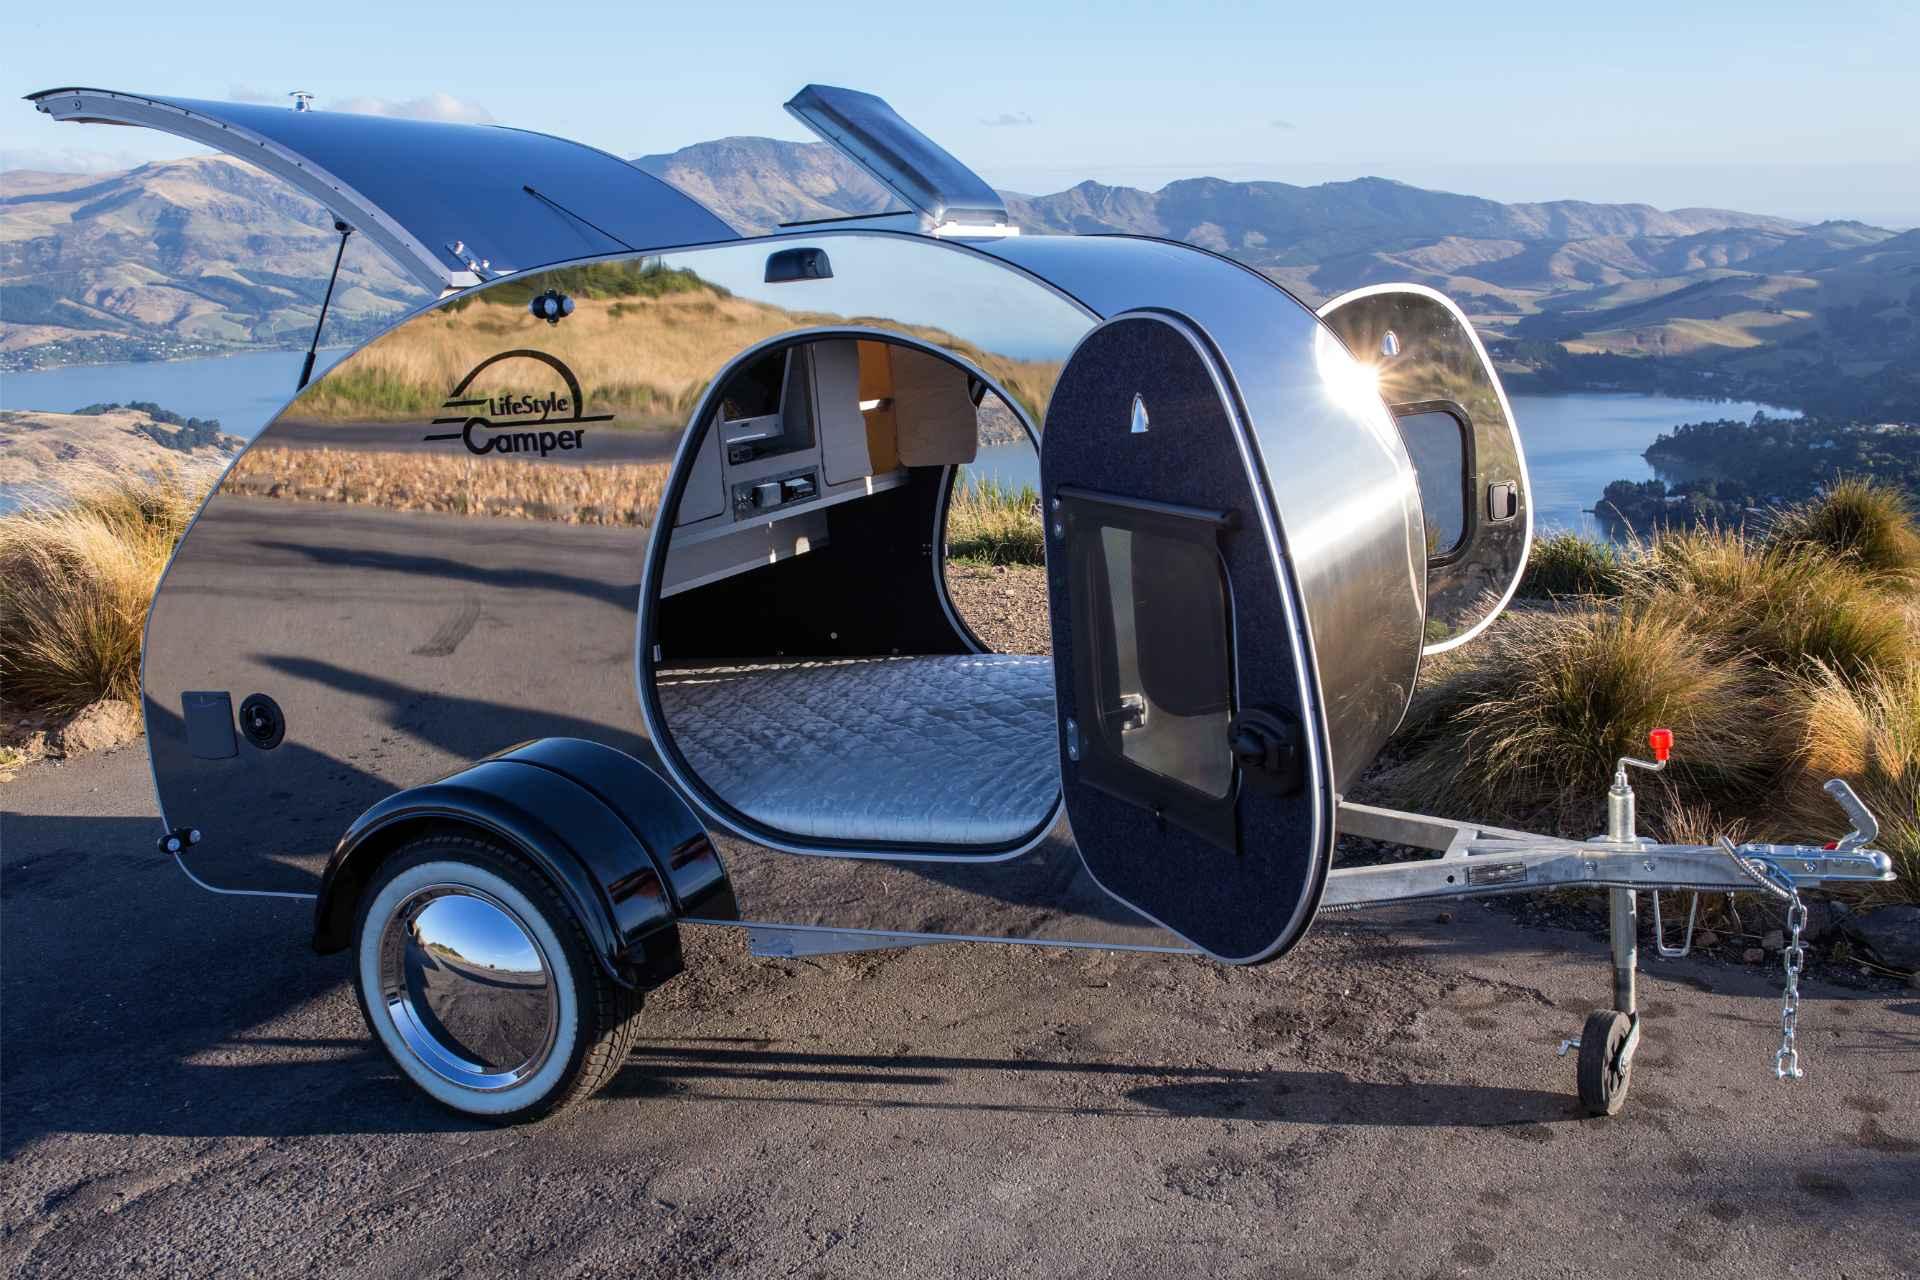 lifestyle camper norge steeldrop teardrop campingvogn produktfoto 3